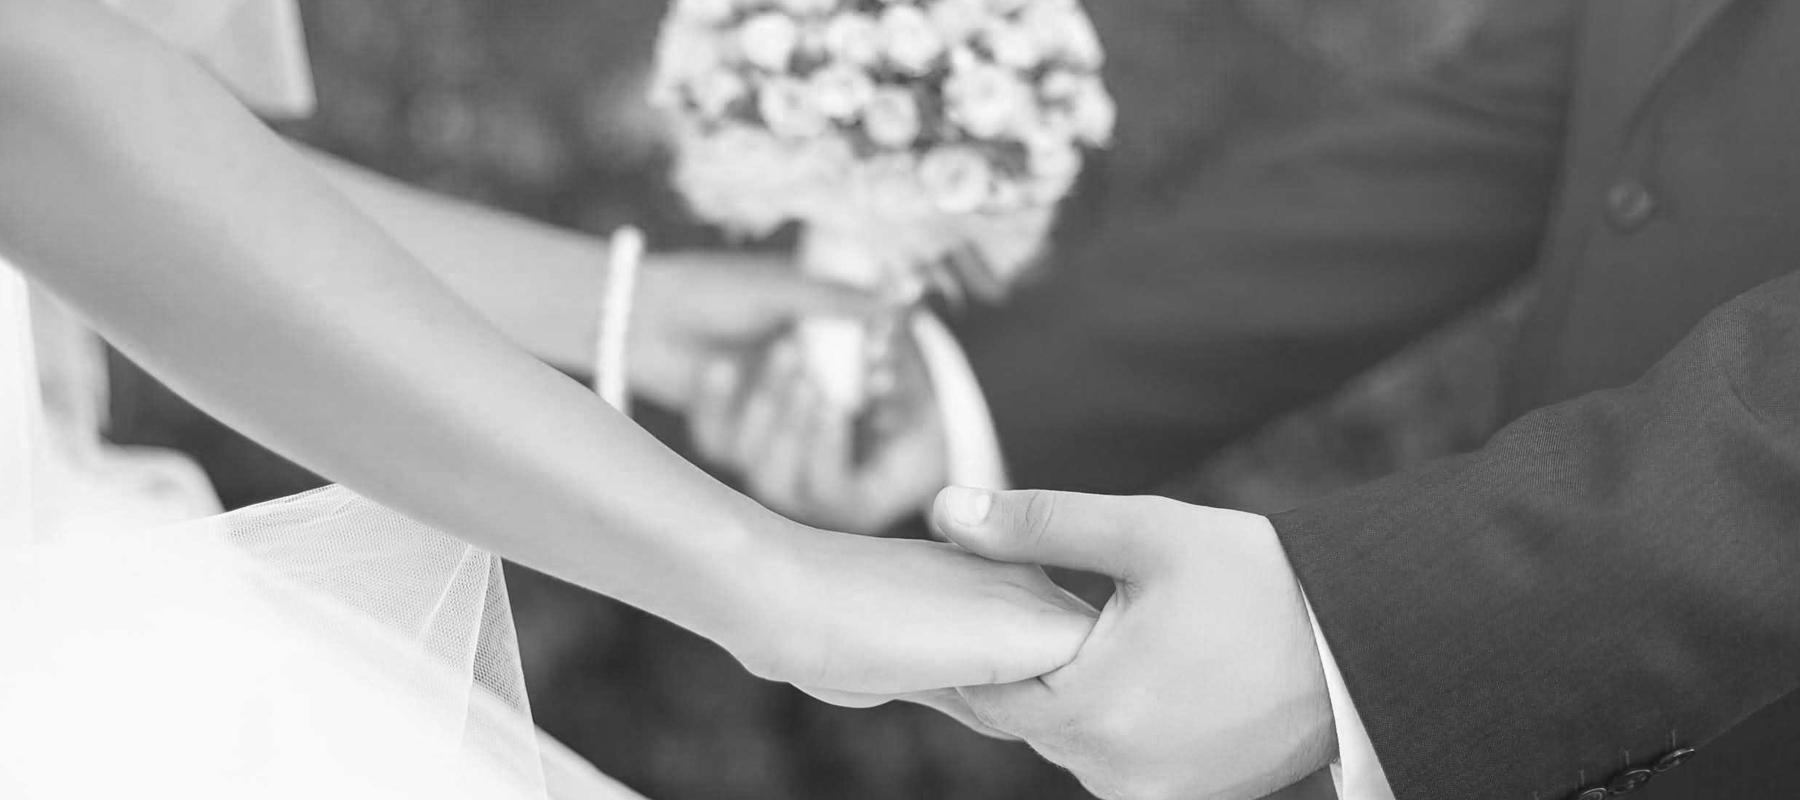 ONDI STUDIO Professional Wedding Videography and Photography | 38 Glenbrook Ave, Toronto, ON M6B 2L8 | +1 647-466-7933